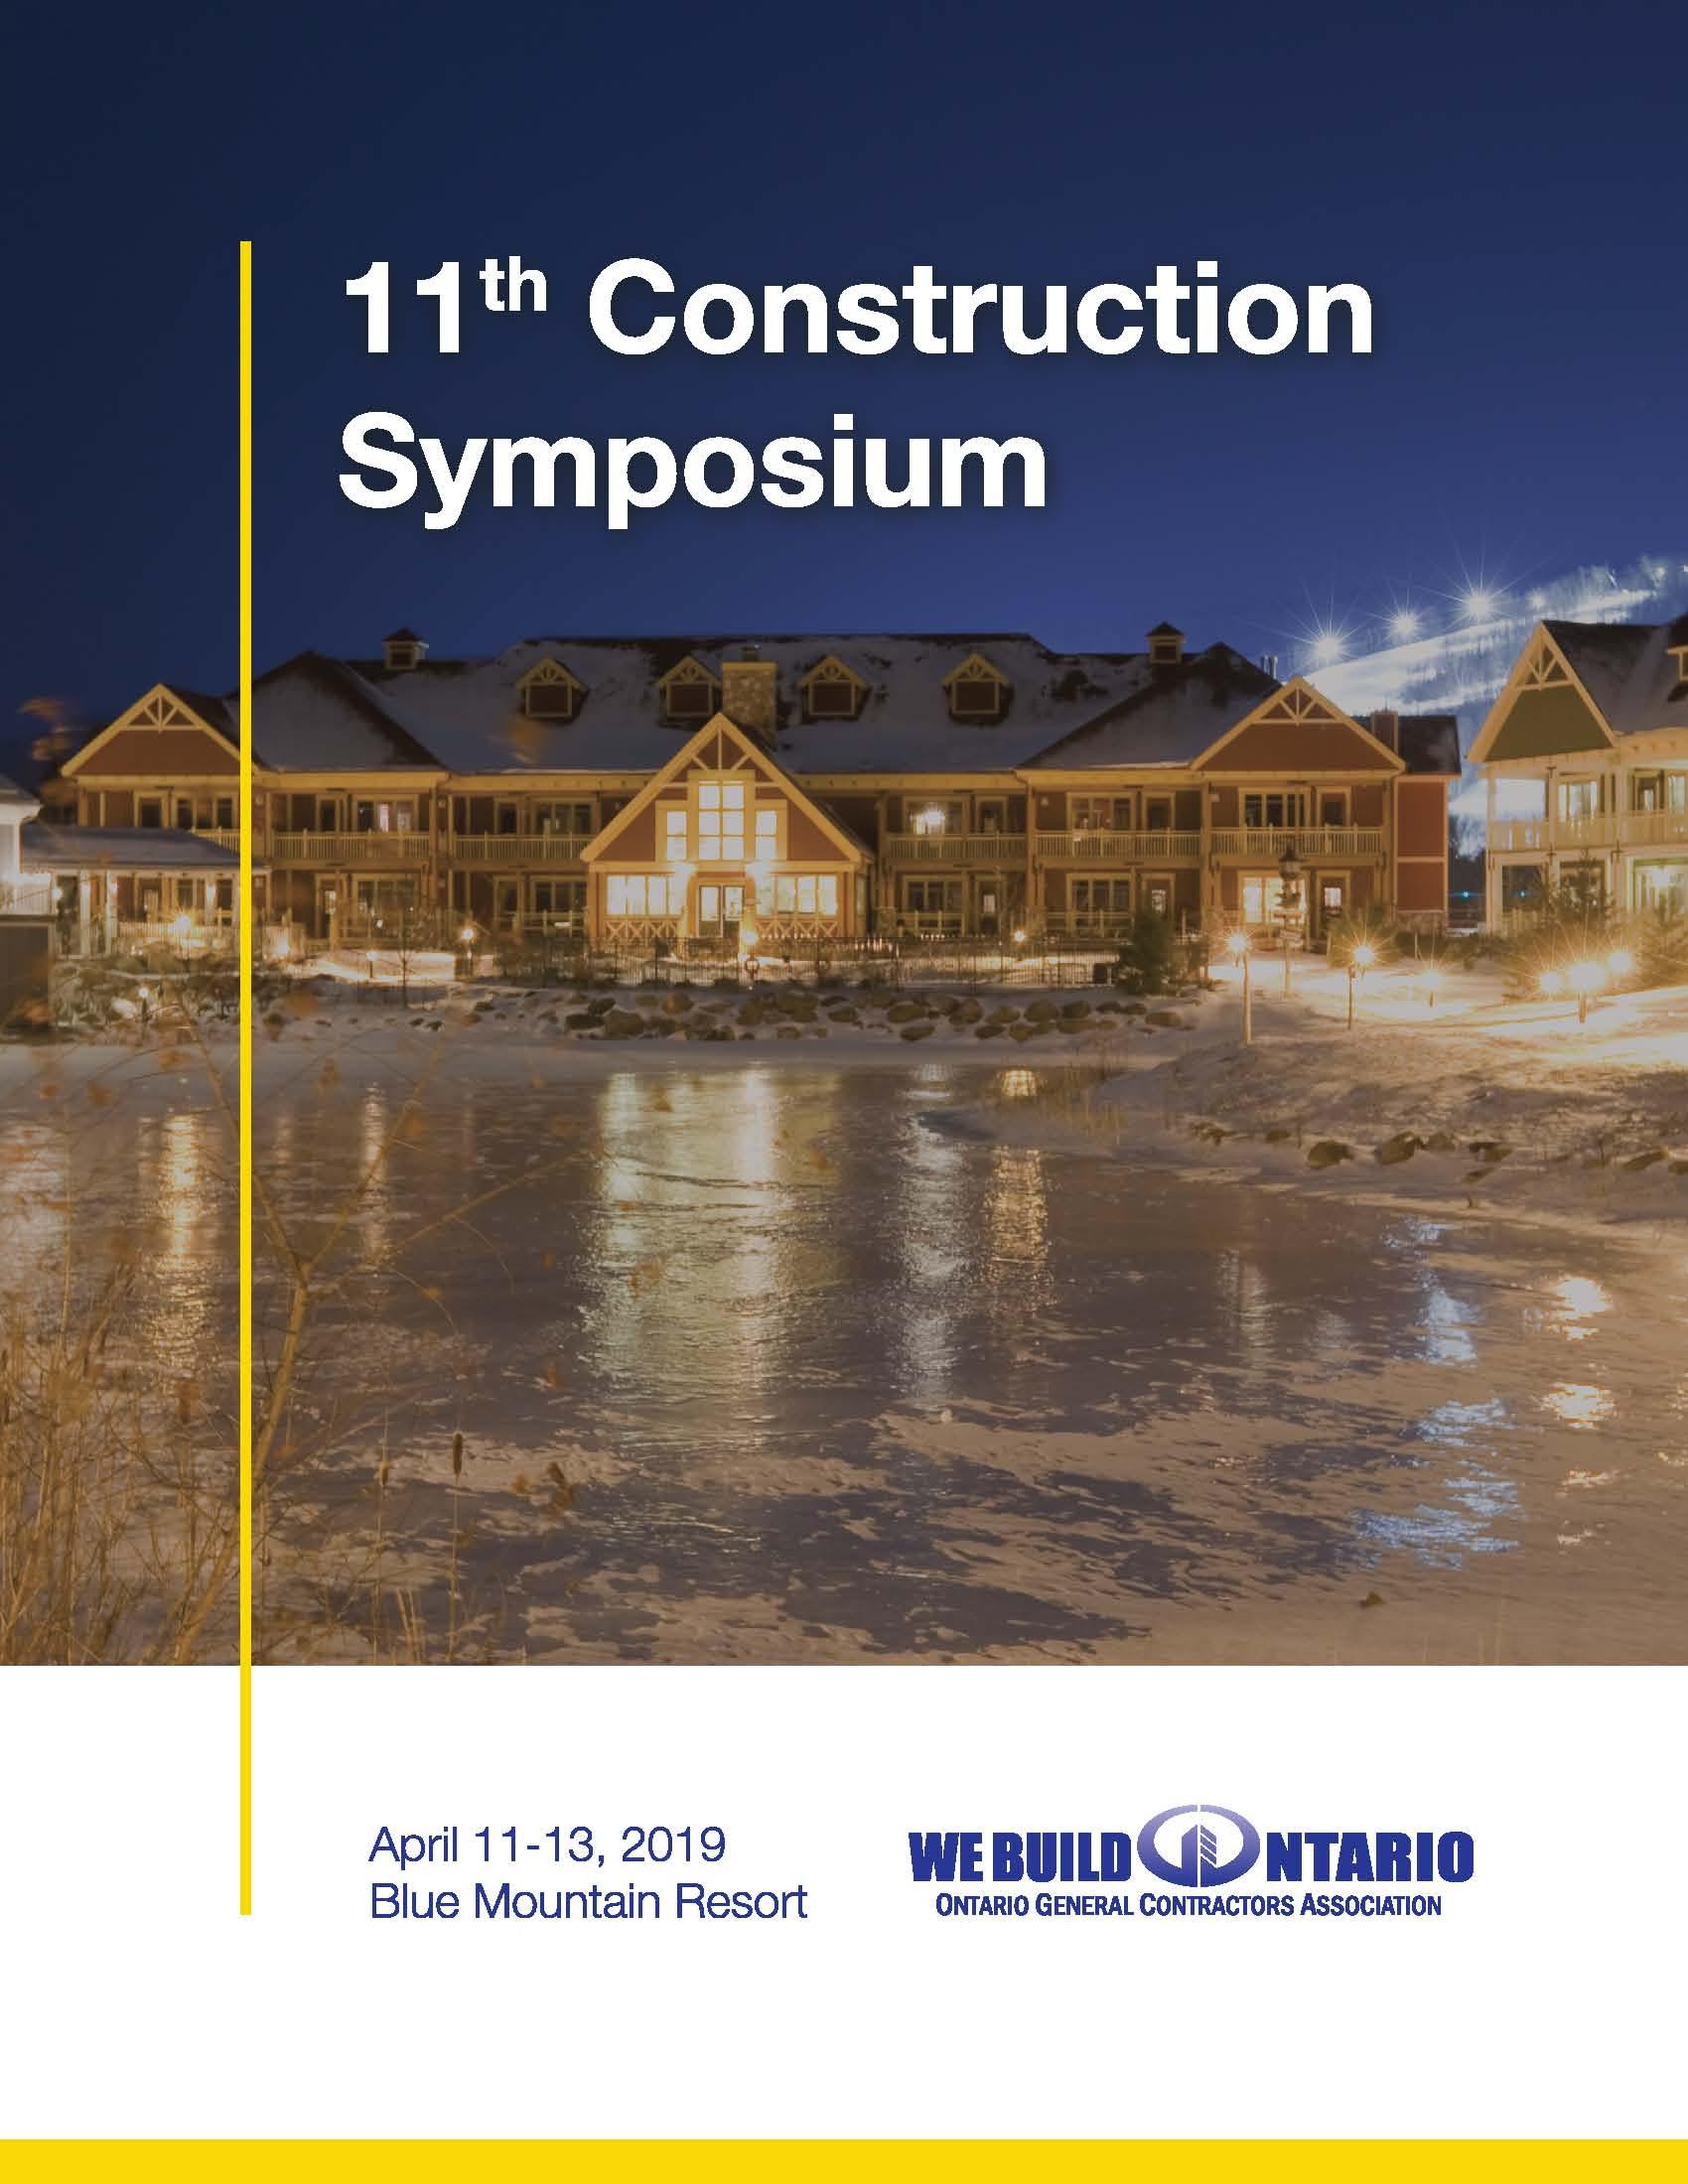 OGCA - 11th CONSTRUCTION SYMPOSIUM 2019